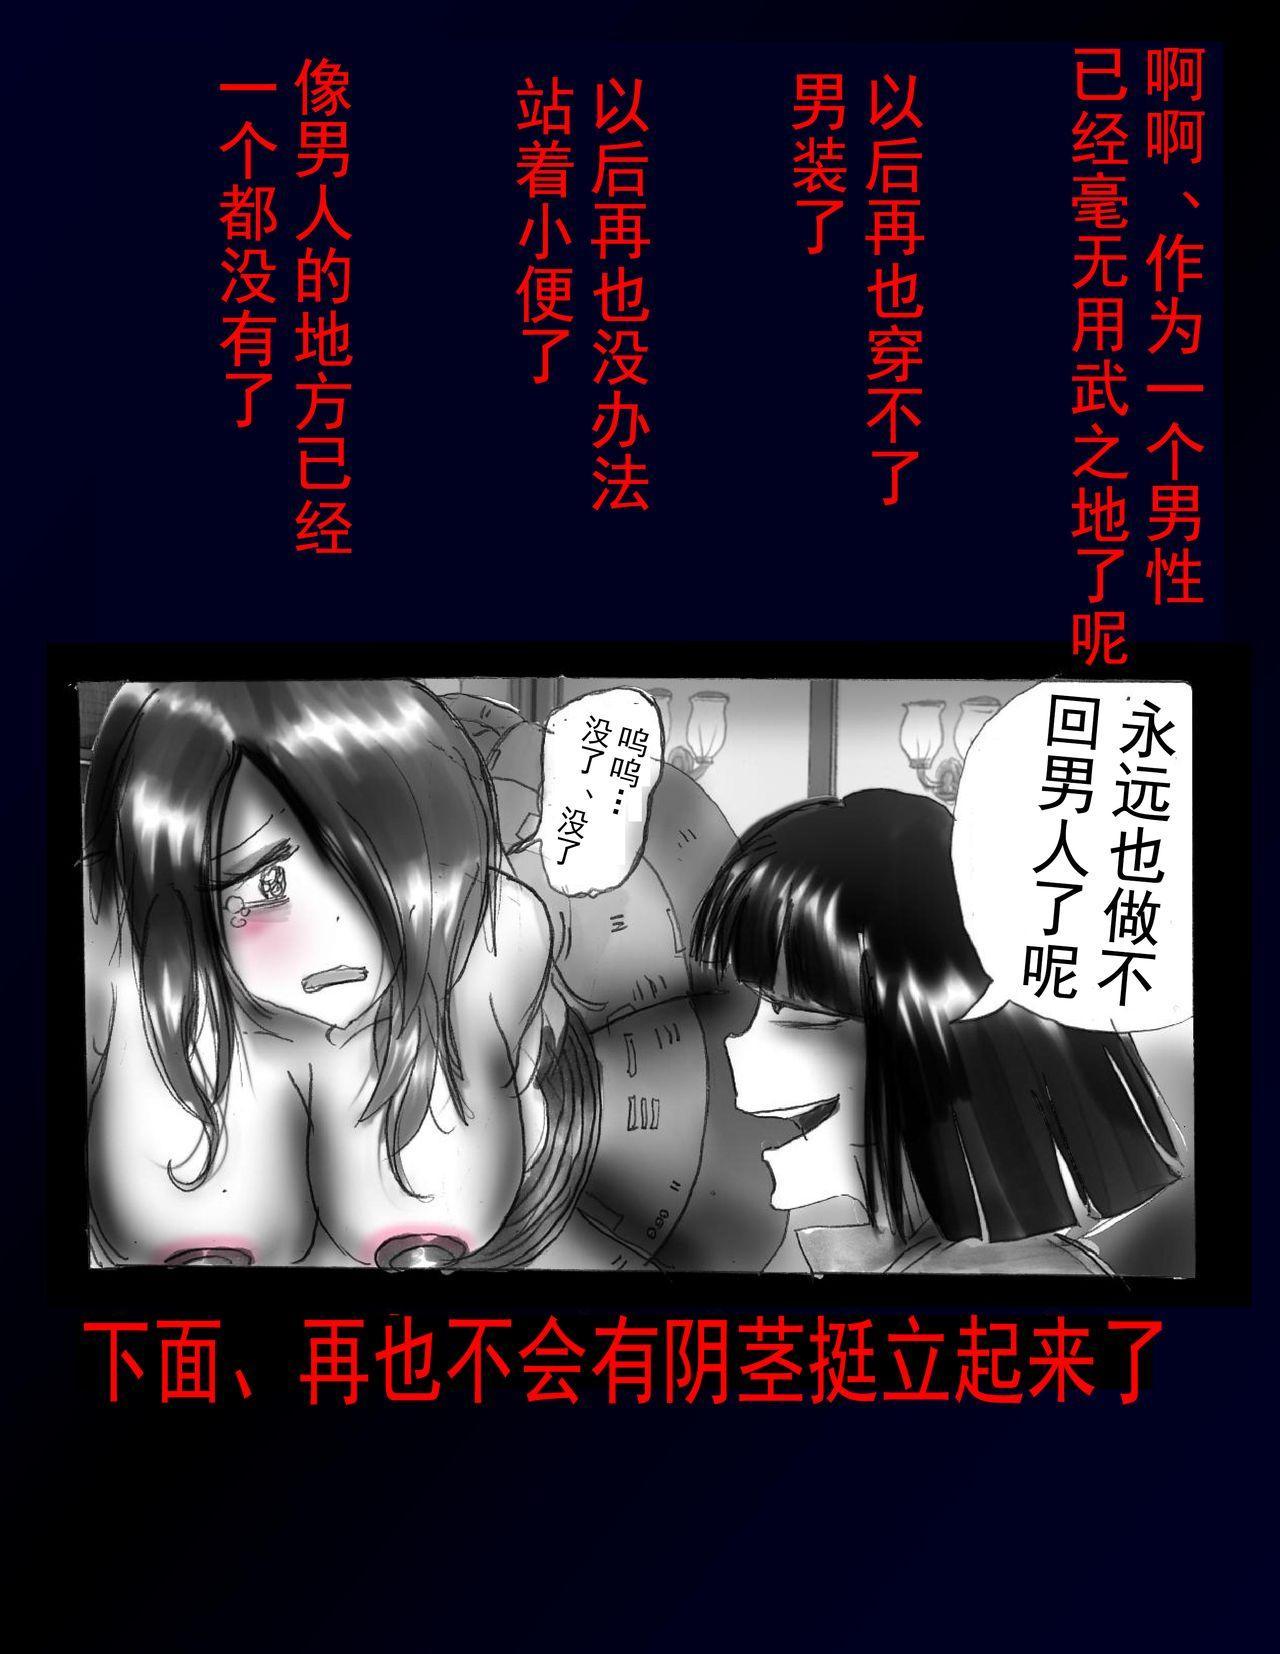 Kyousei Nyotaika Dress 41